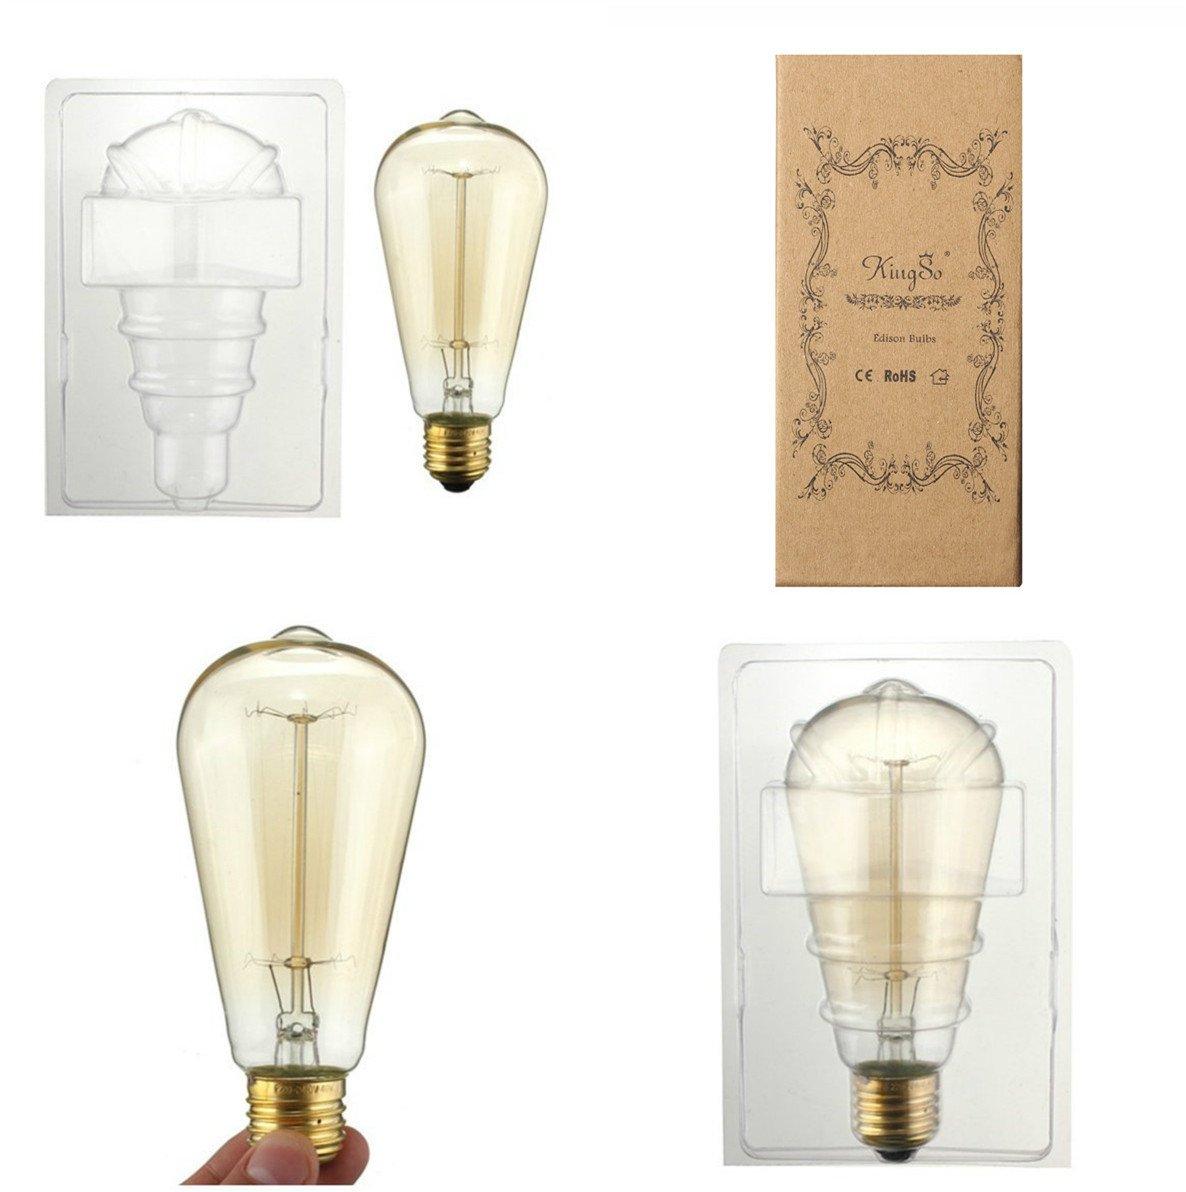 KINGSO Vintage Edison Bulbs 60W Squirrel Cage Filament Incandescent Antique Light Bulb for Home Light Fixtures E27 E26 Base ST64 110V - 6 Pack